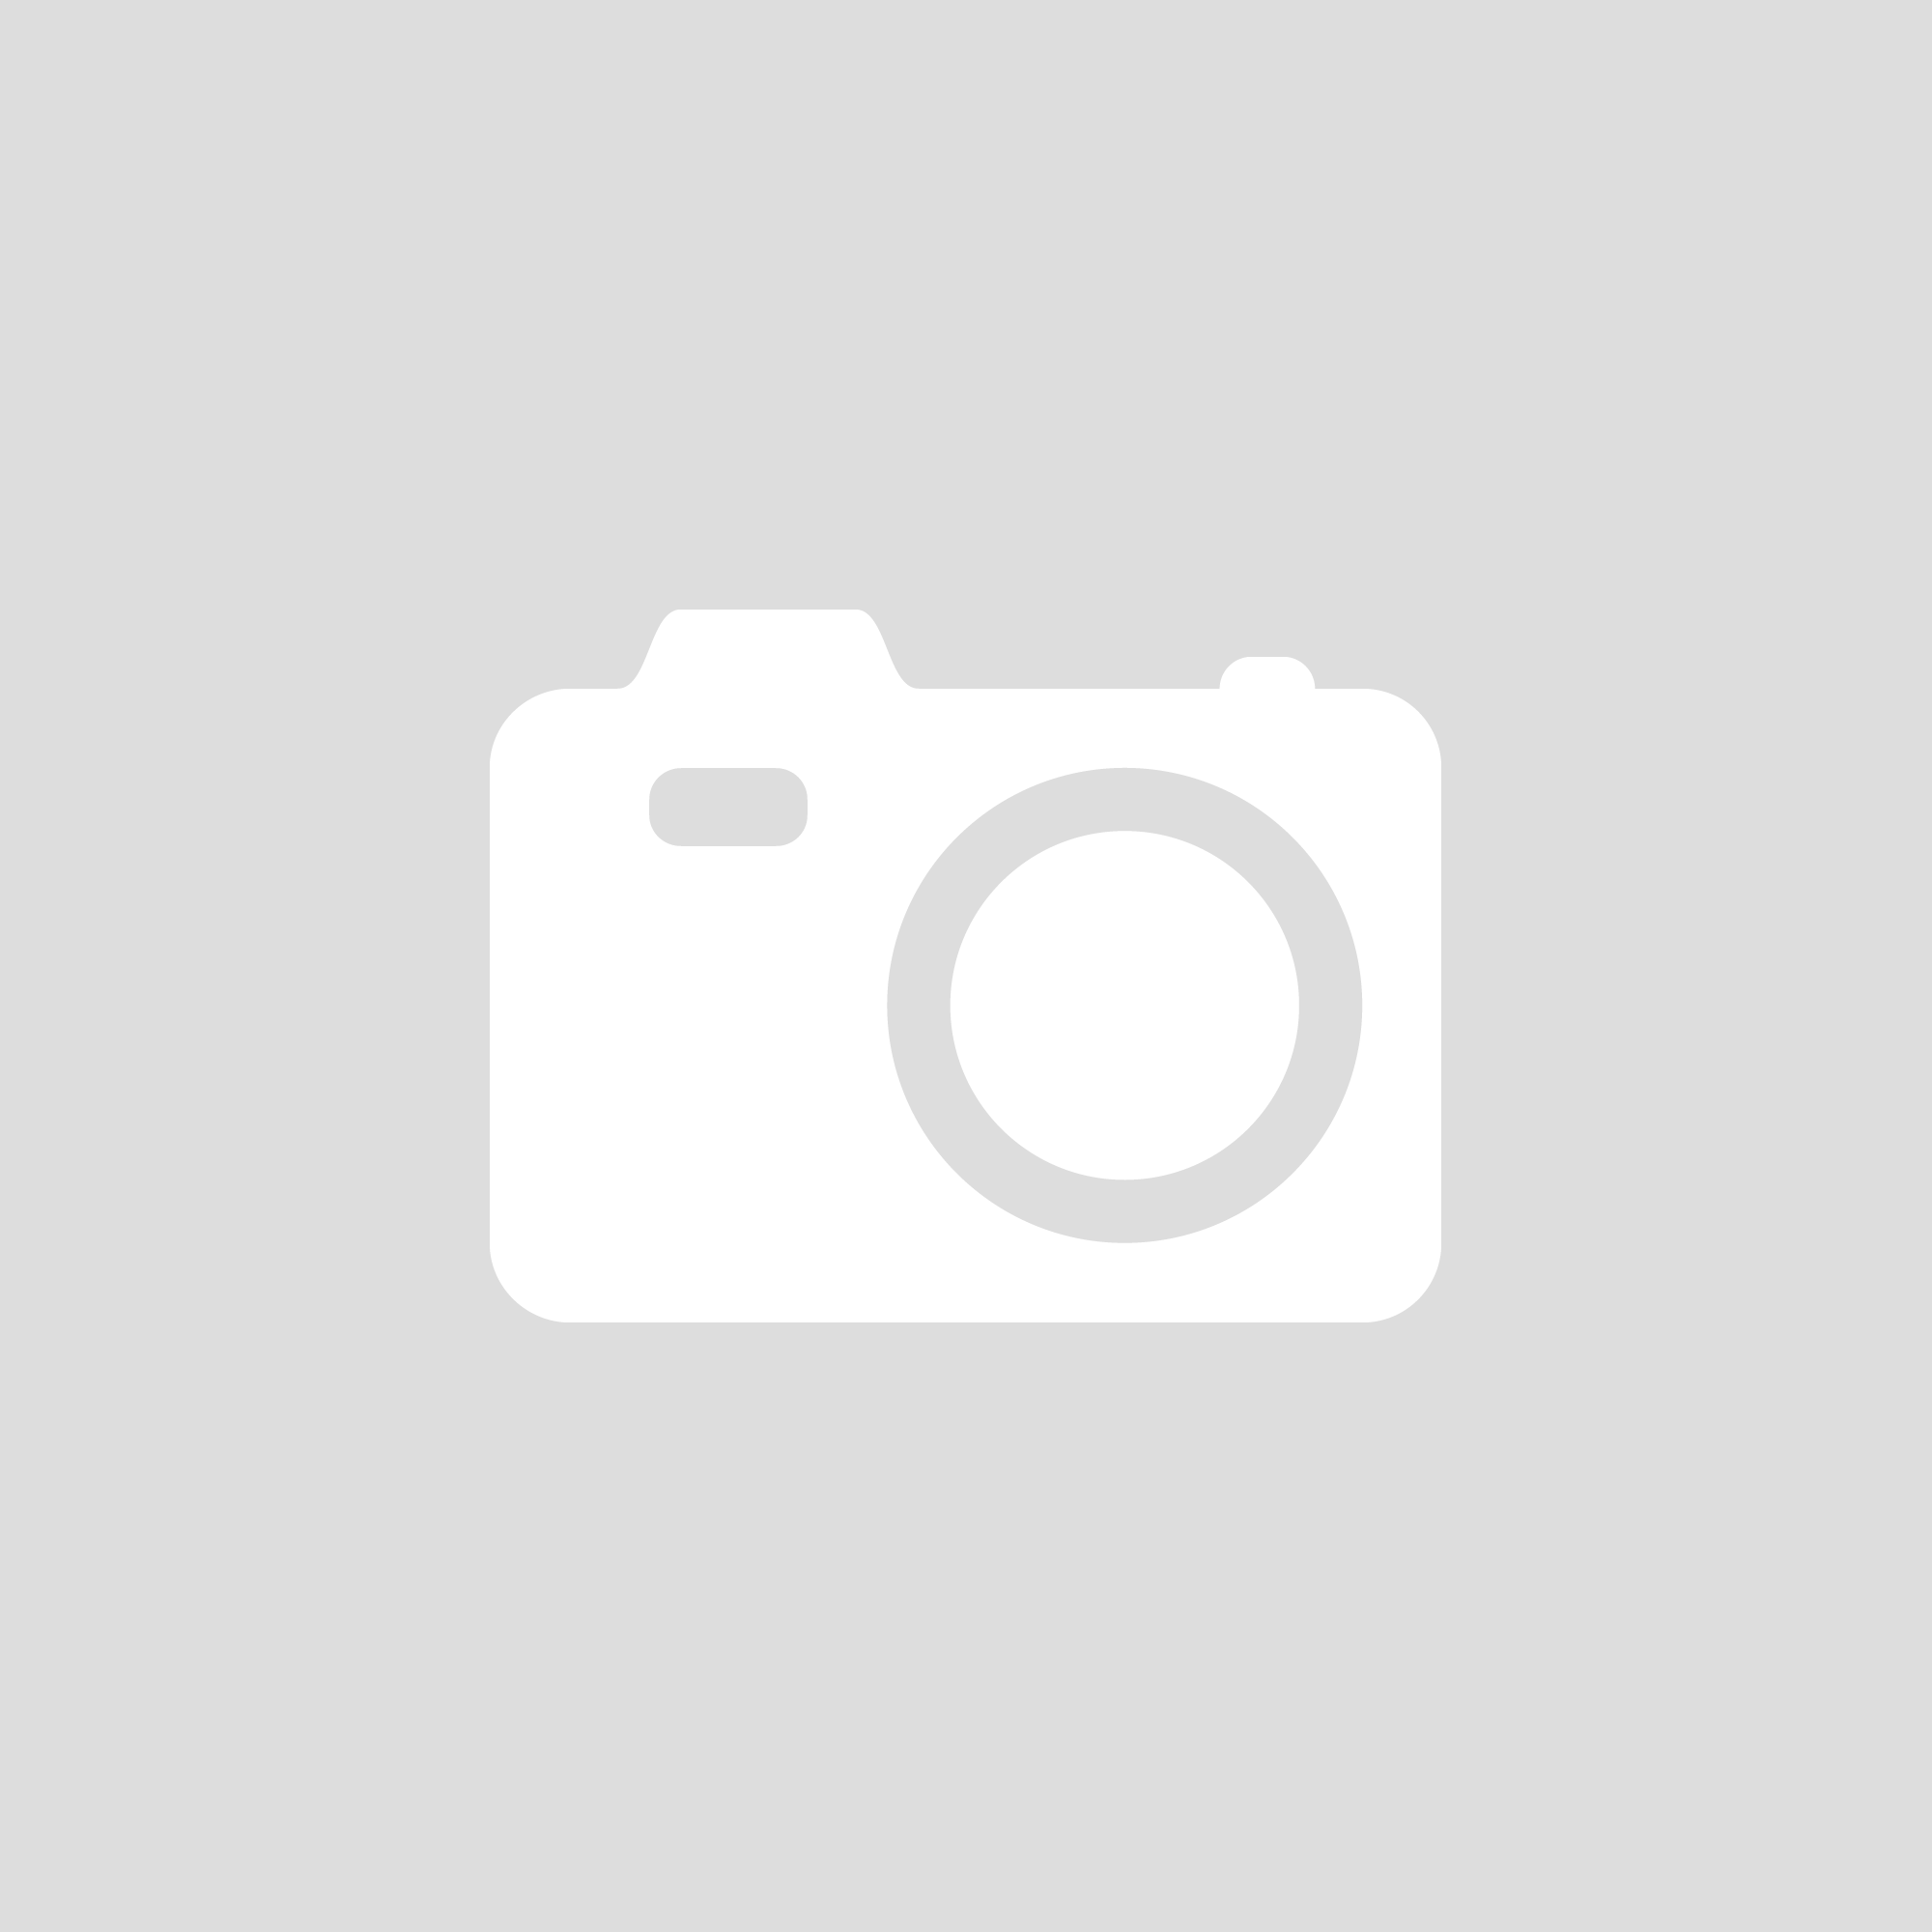 Rose Macintosh White Wallpaper by Graham & Brown Superfresco Texture 13438